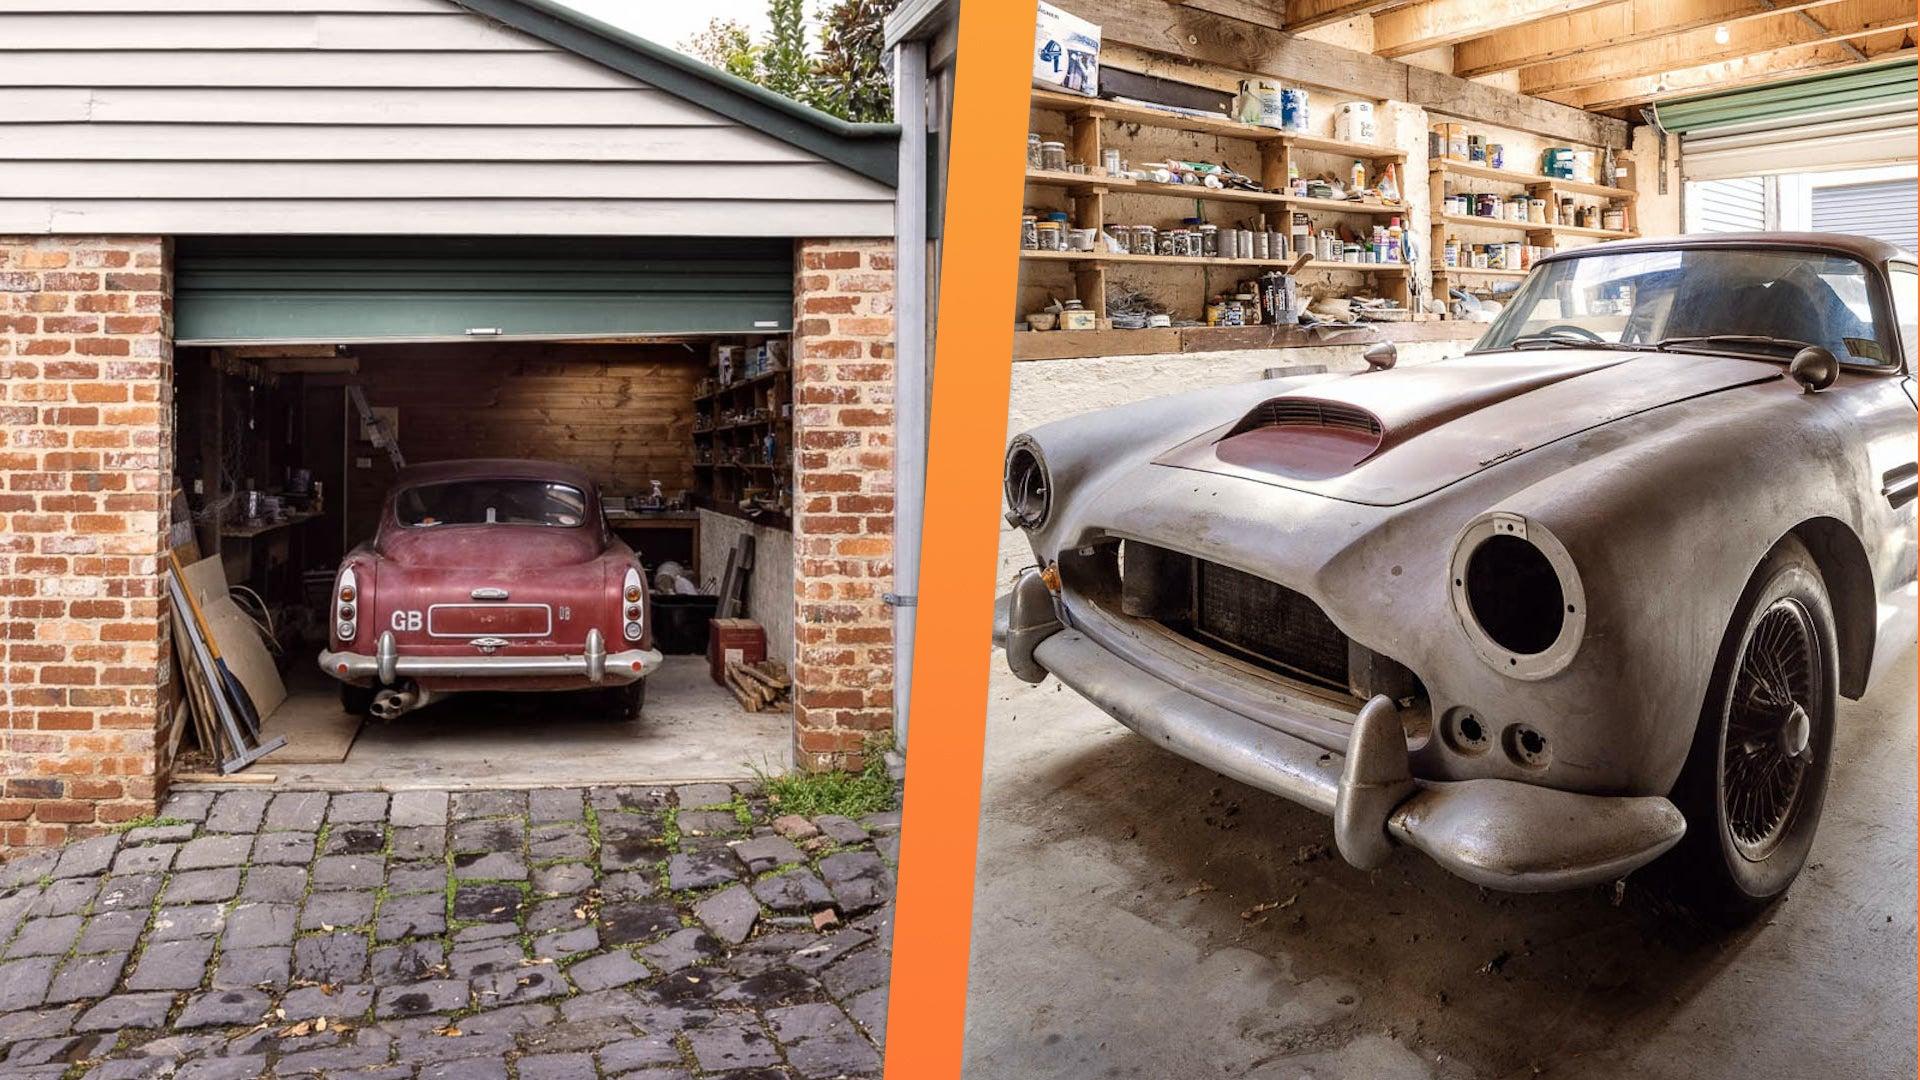 Aston Martin Klasik Dijual di Facebook, Punya Kejutan Dahsyat